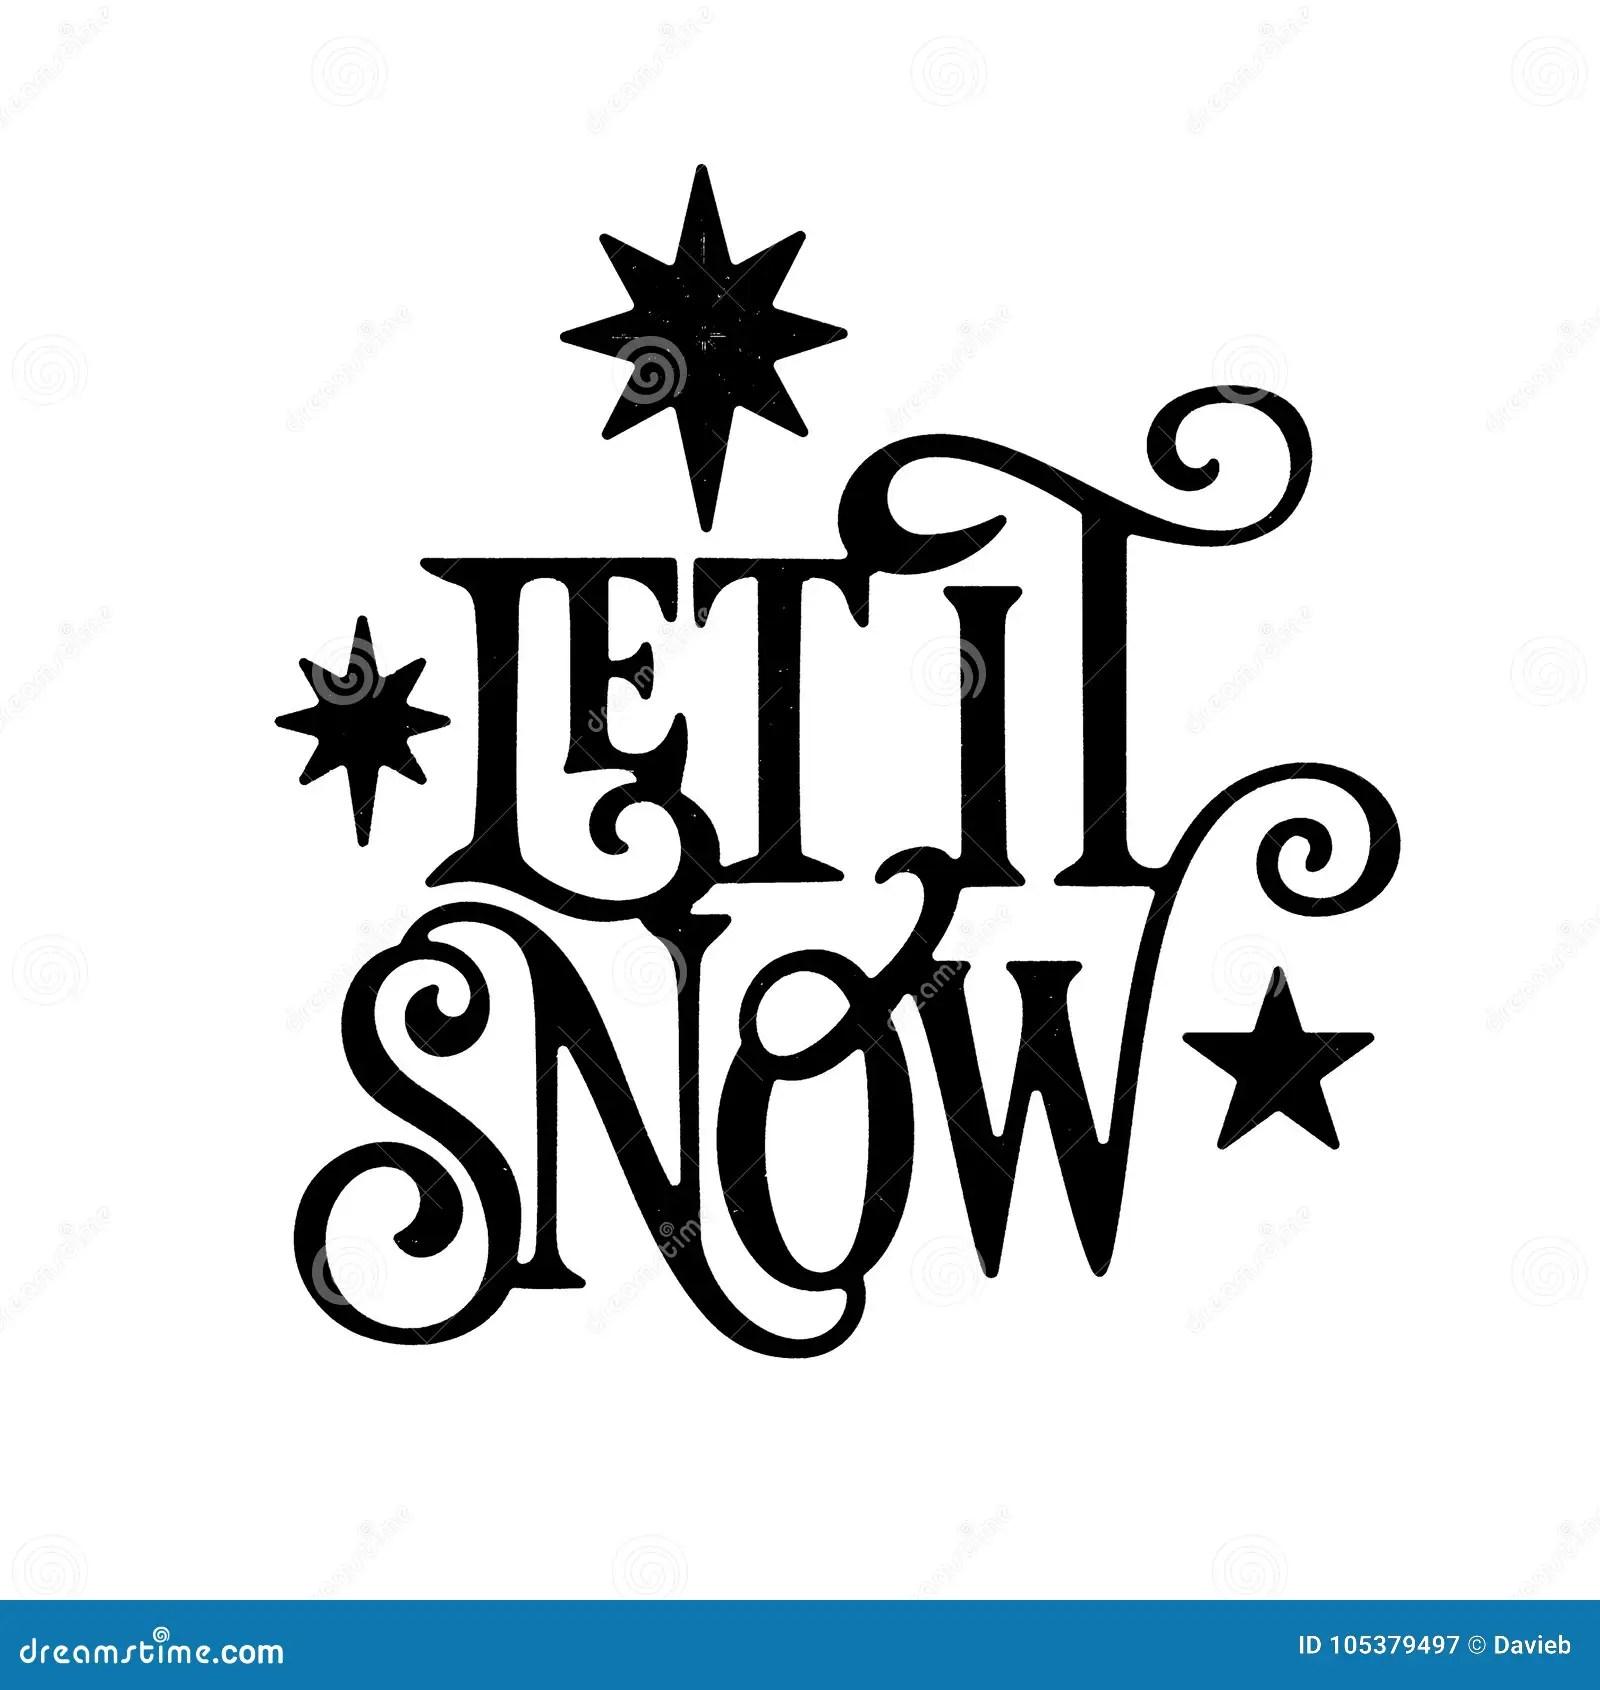 Let It Snow Christmas Wordart Stock Illustration